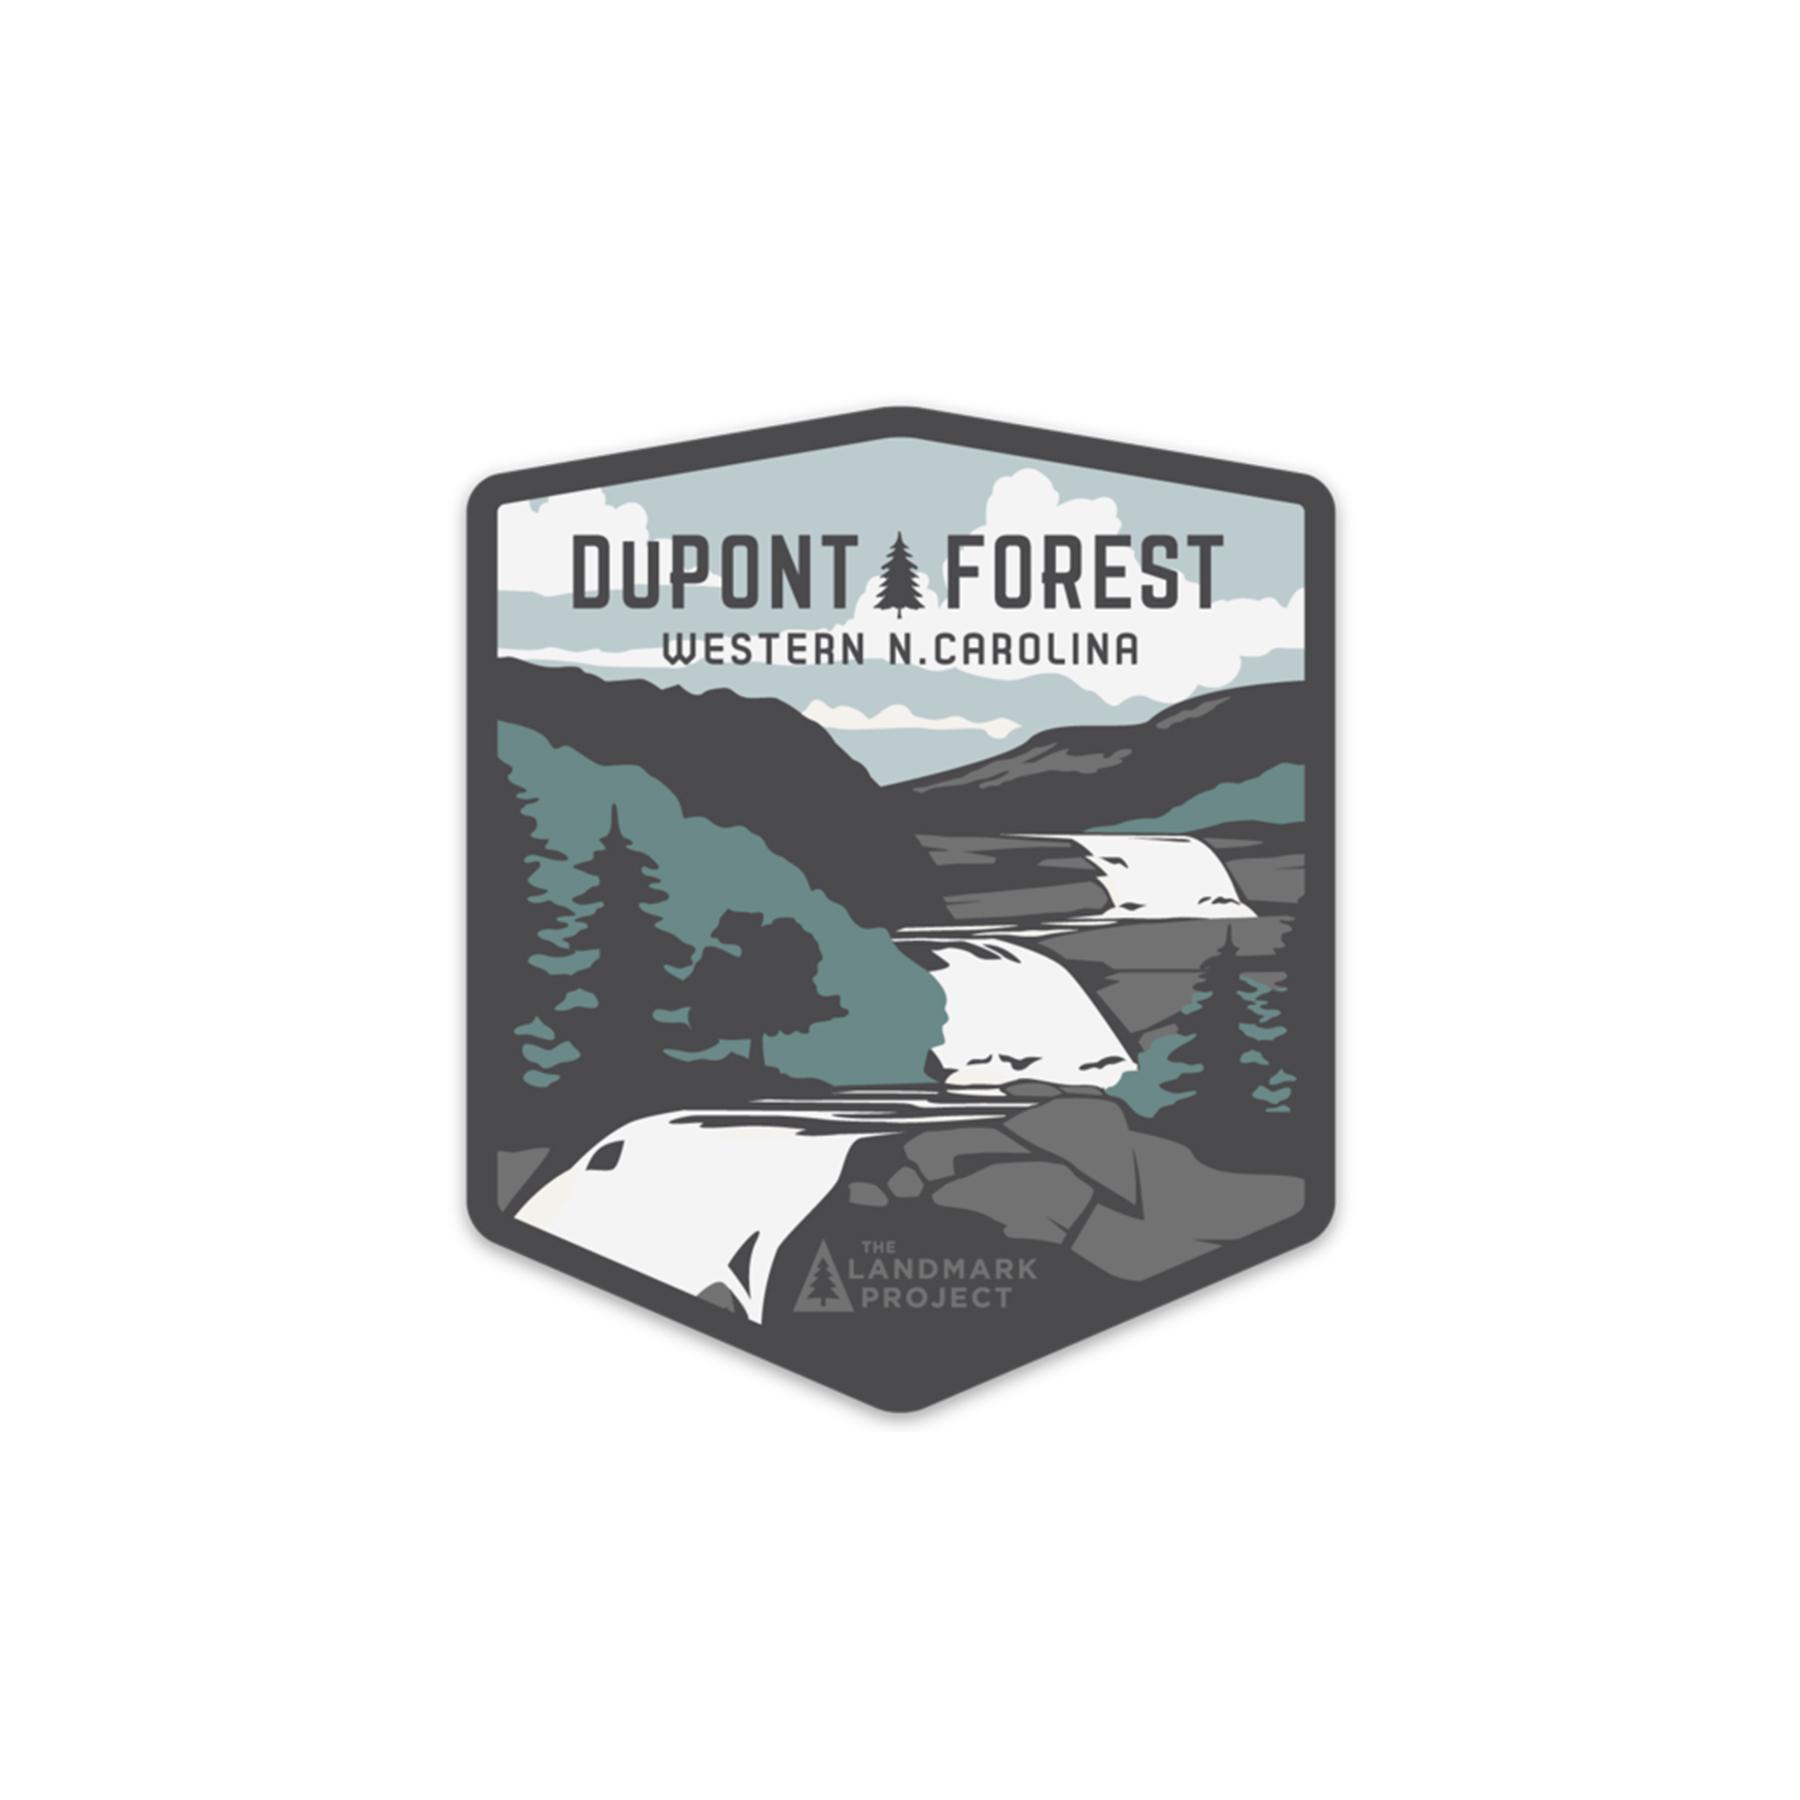 dupont-forest-sticker.jpg